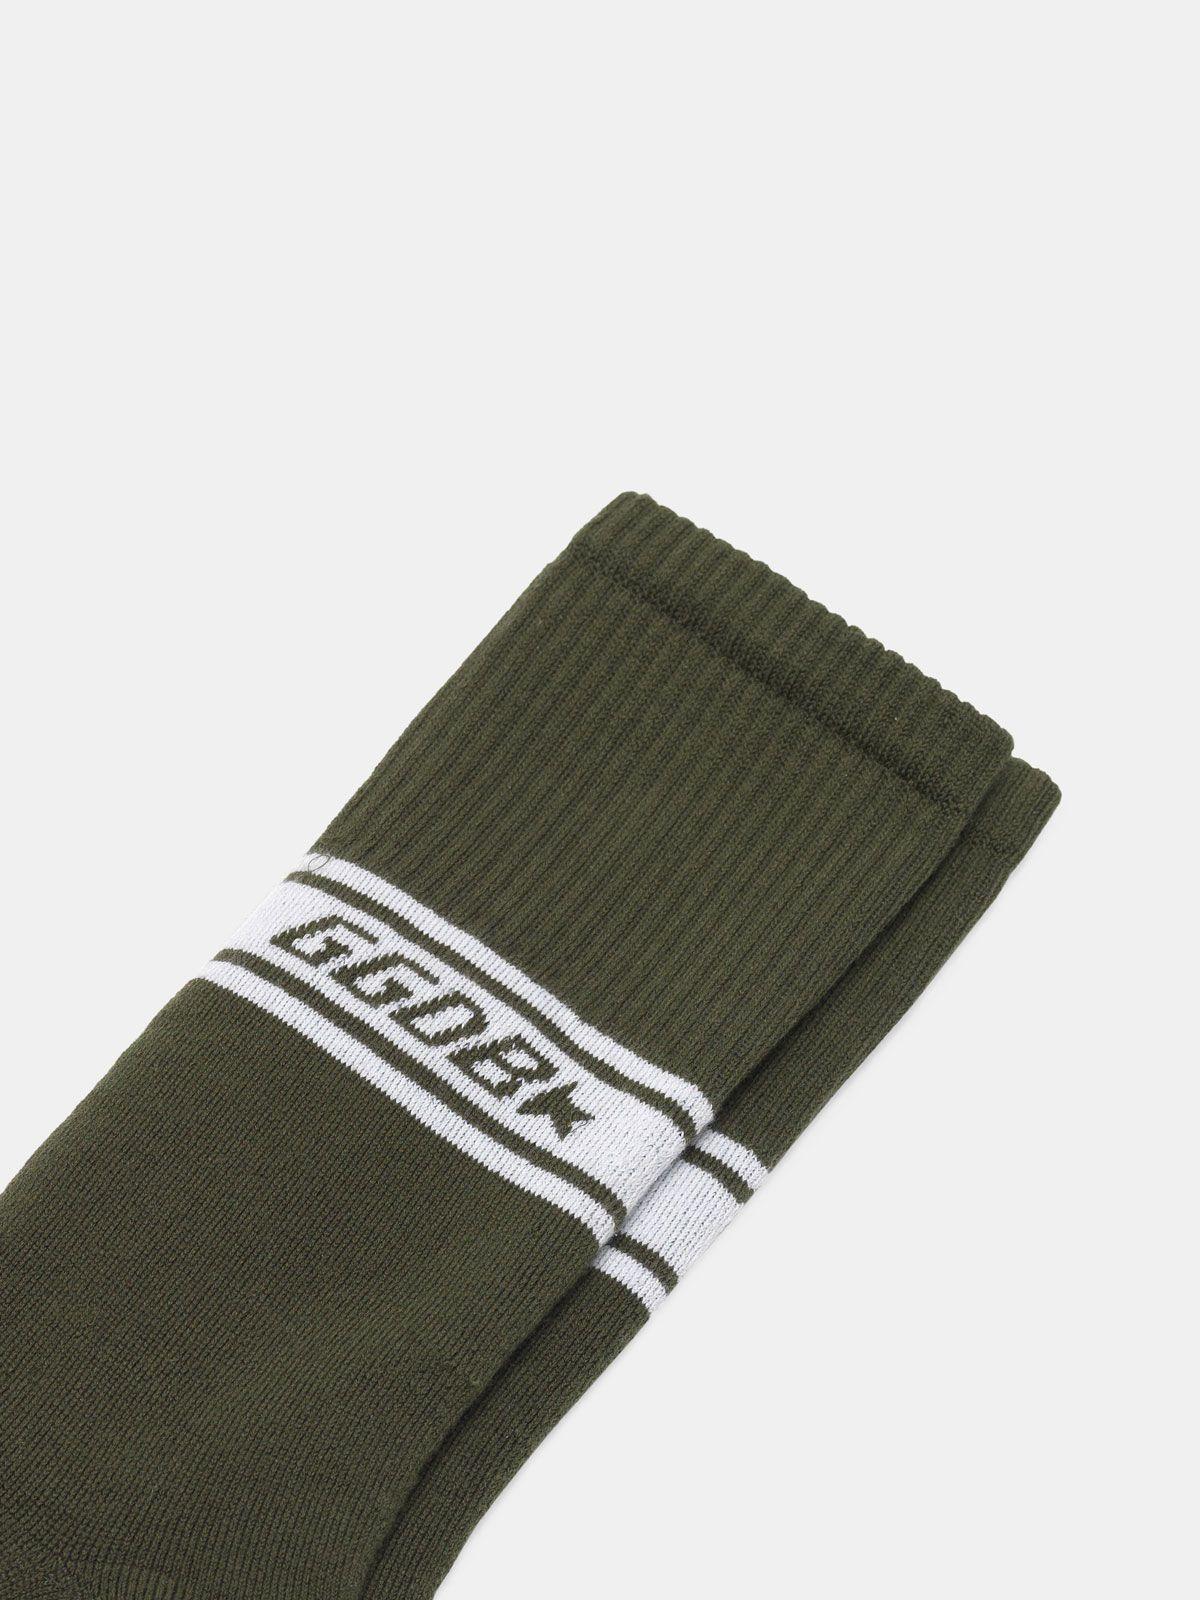 Golden Goose - Short Hideki terry socks with jacquard logo in